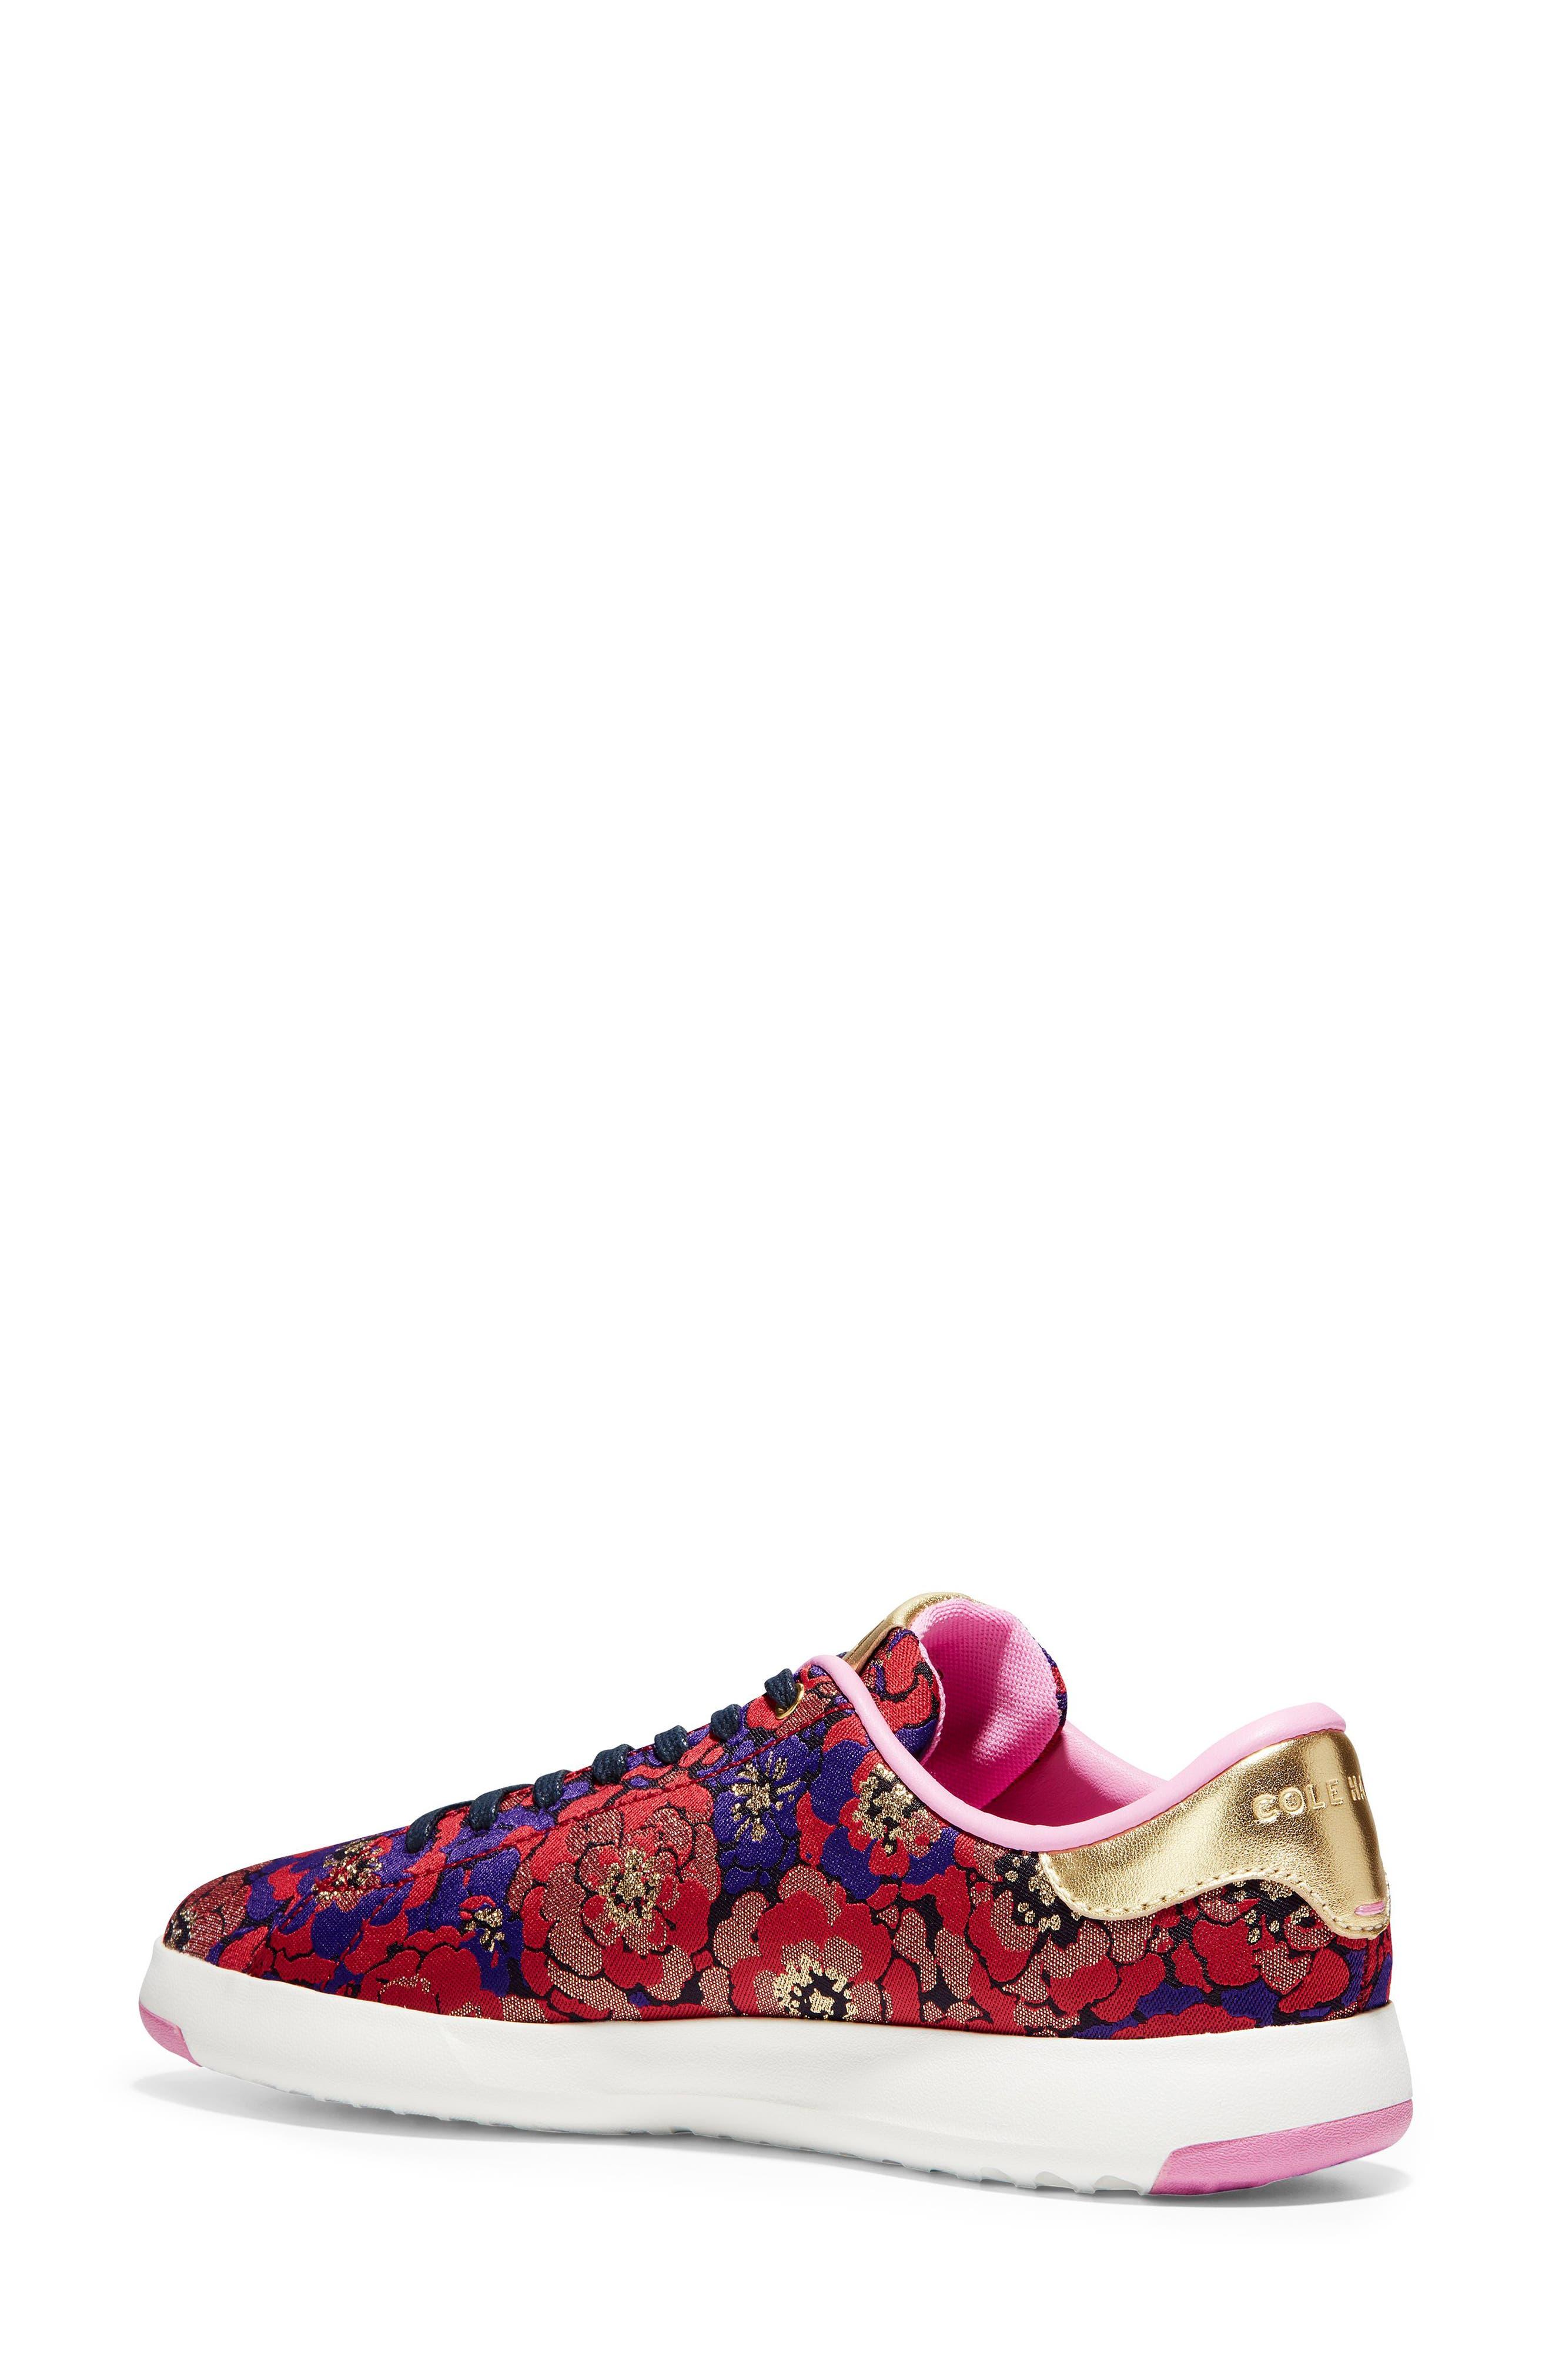 GrandPro Tennis Shoe,                             Alternate thumbnail 2, color,                             GOLD BROCADE FABRIC